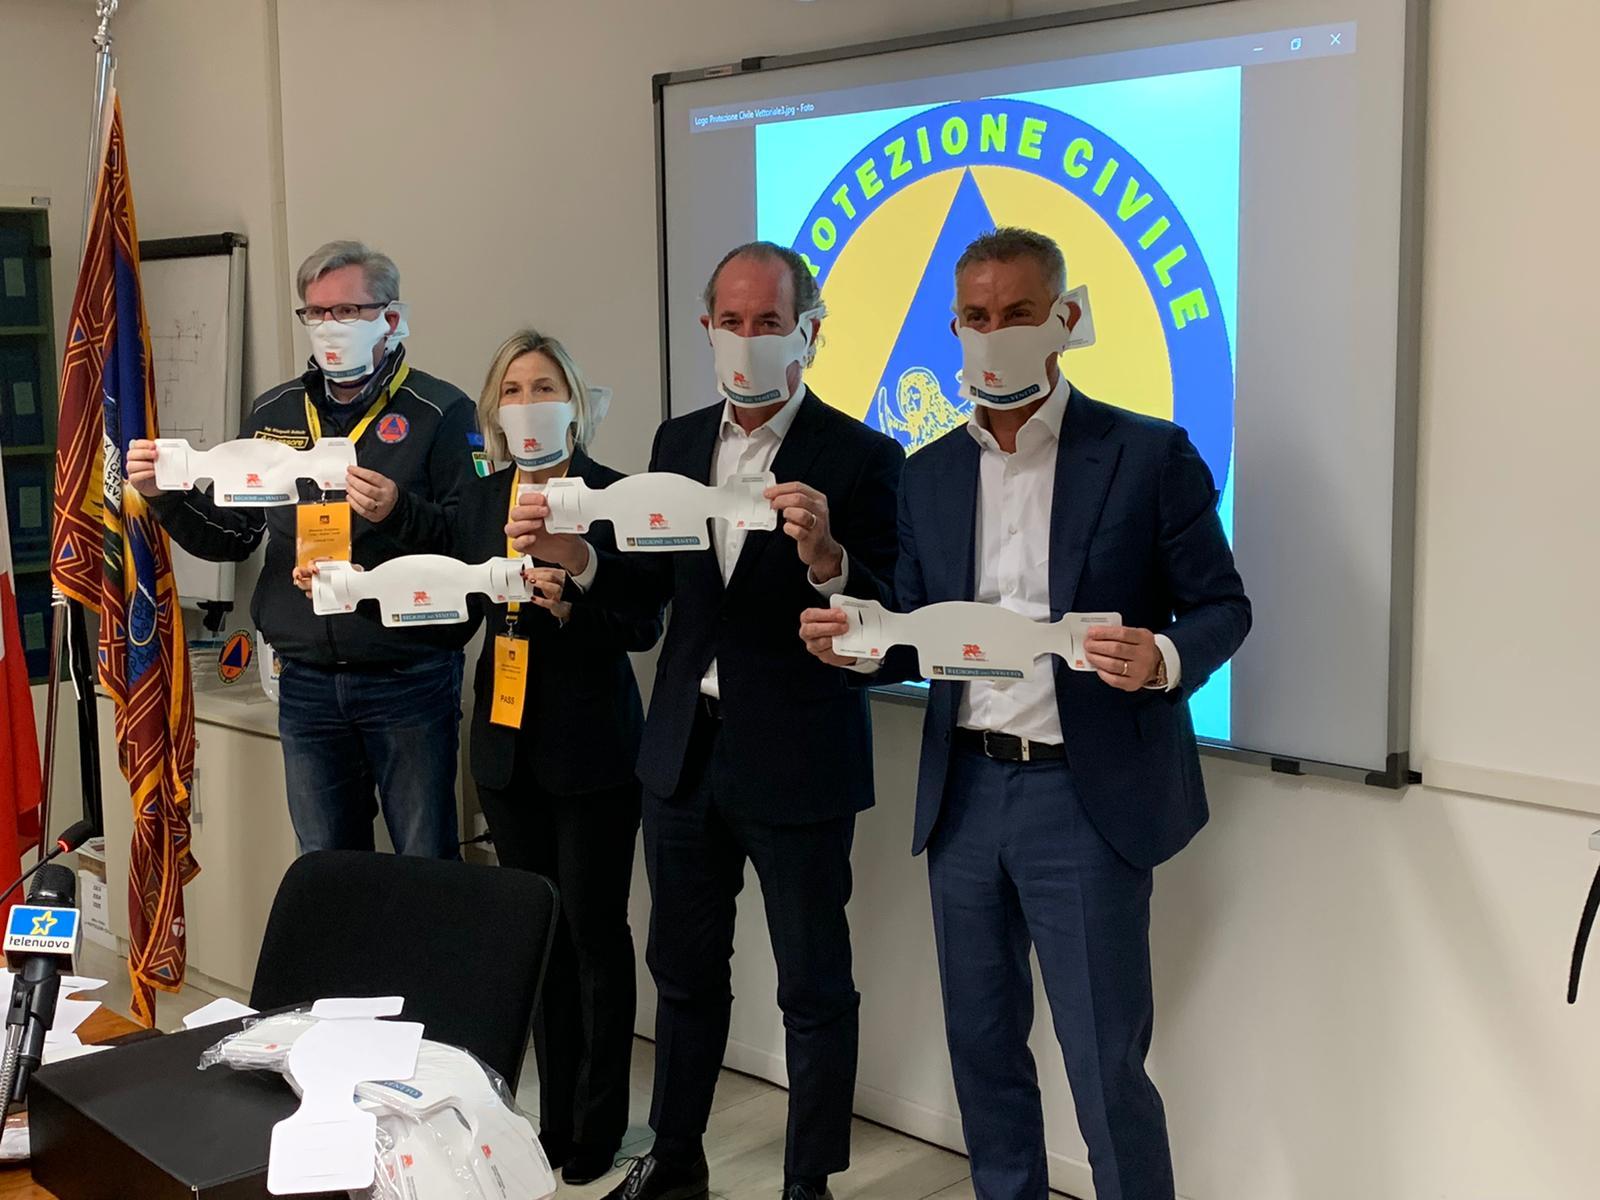 Fabio Franceschi, Luca Zaia, Manuela Lanzarin e Giampaolo Bottacin